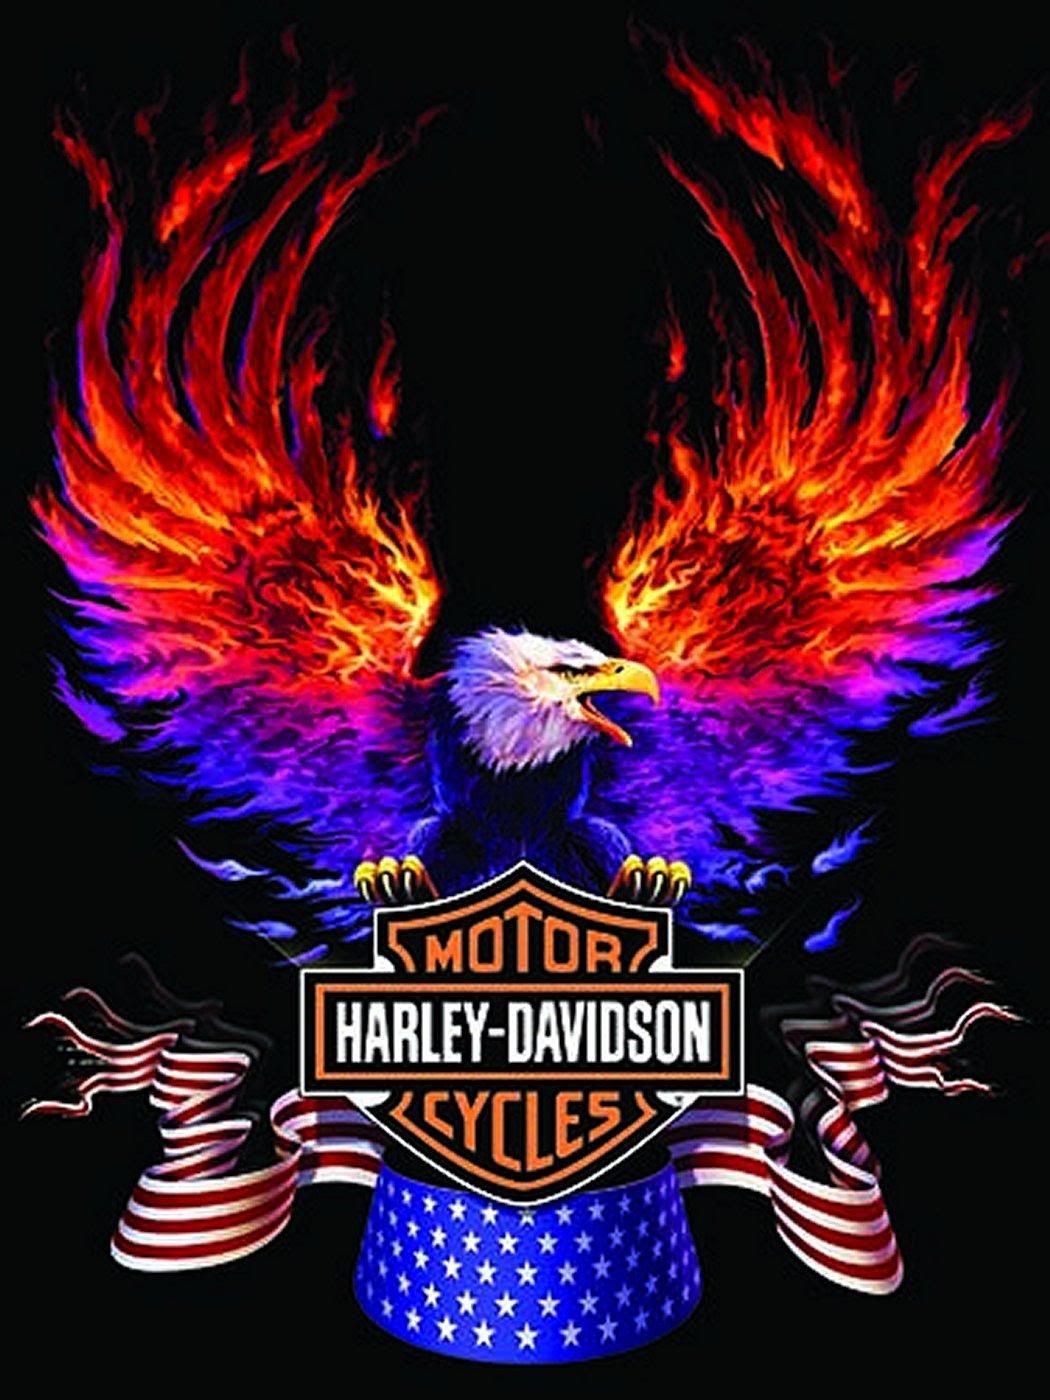 Harley Davidson Logo Wallpapers Harley Davidson Posters